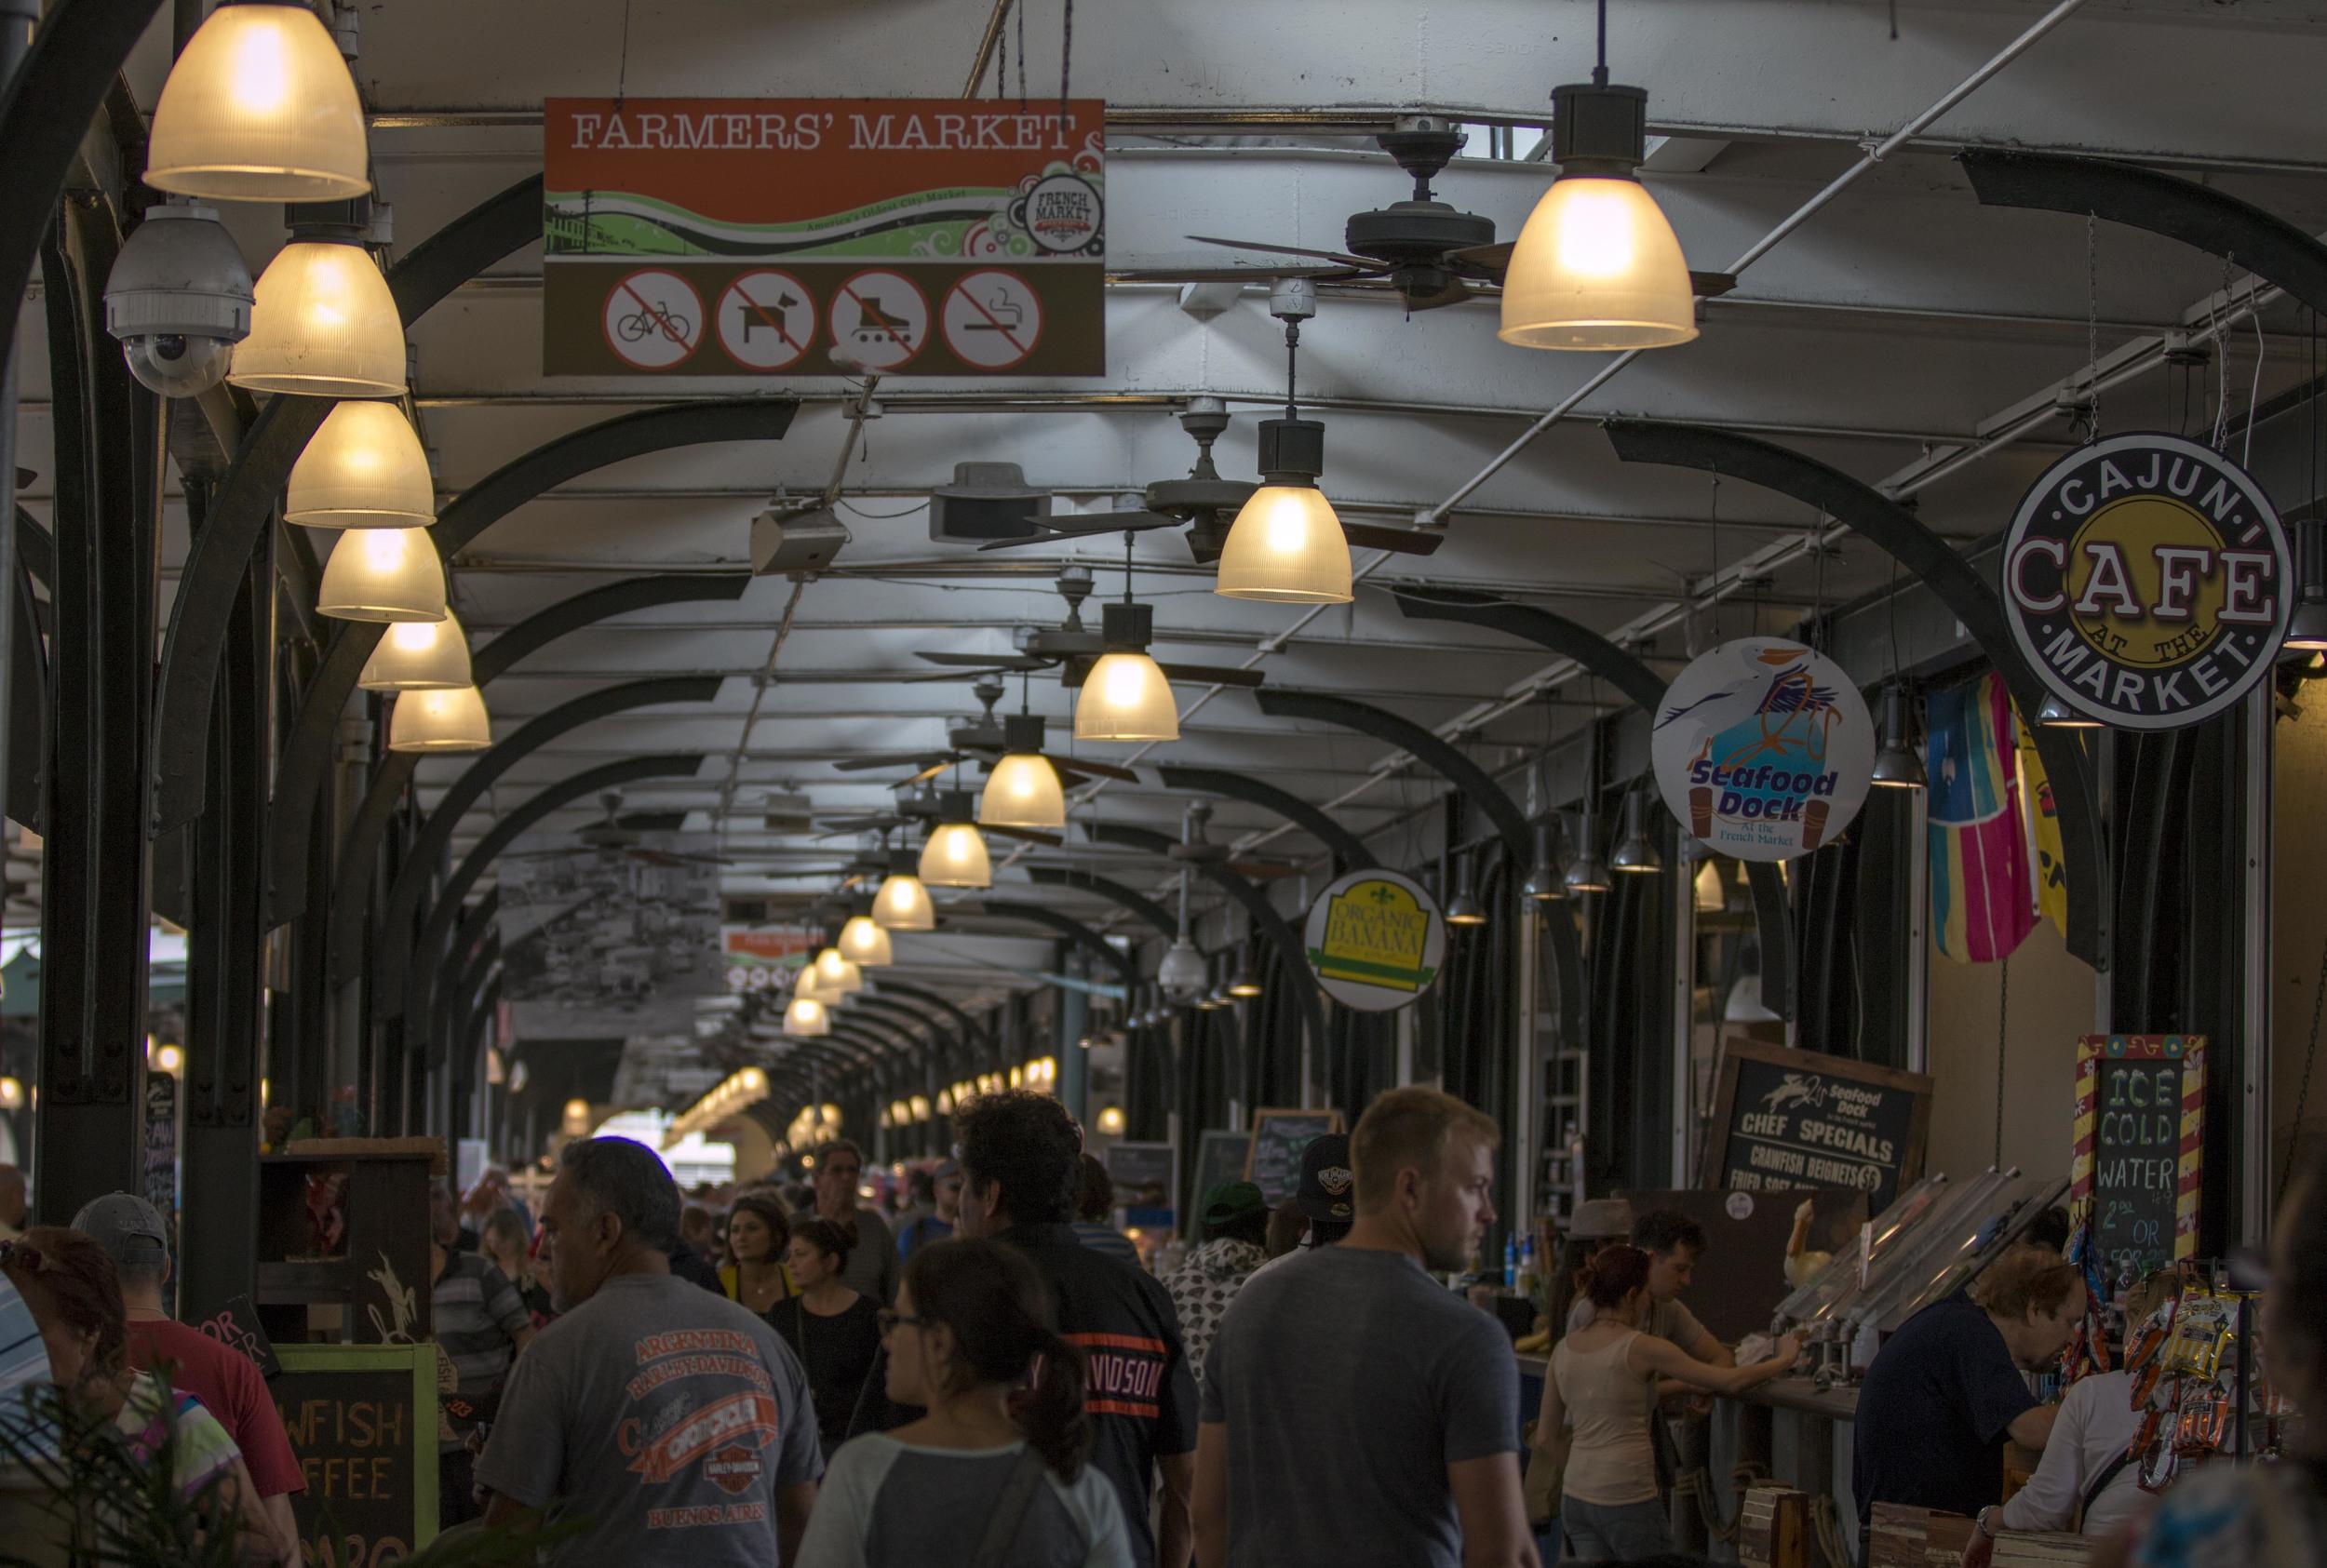 New Orleans farmers market-1.jpg